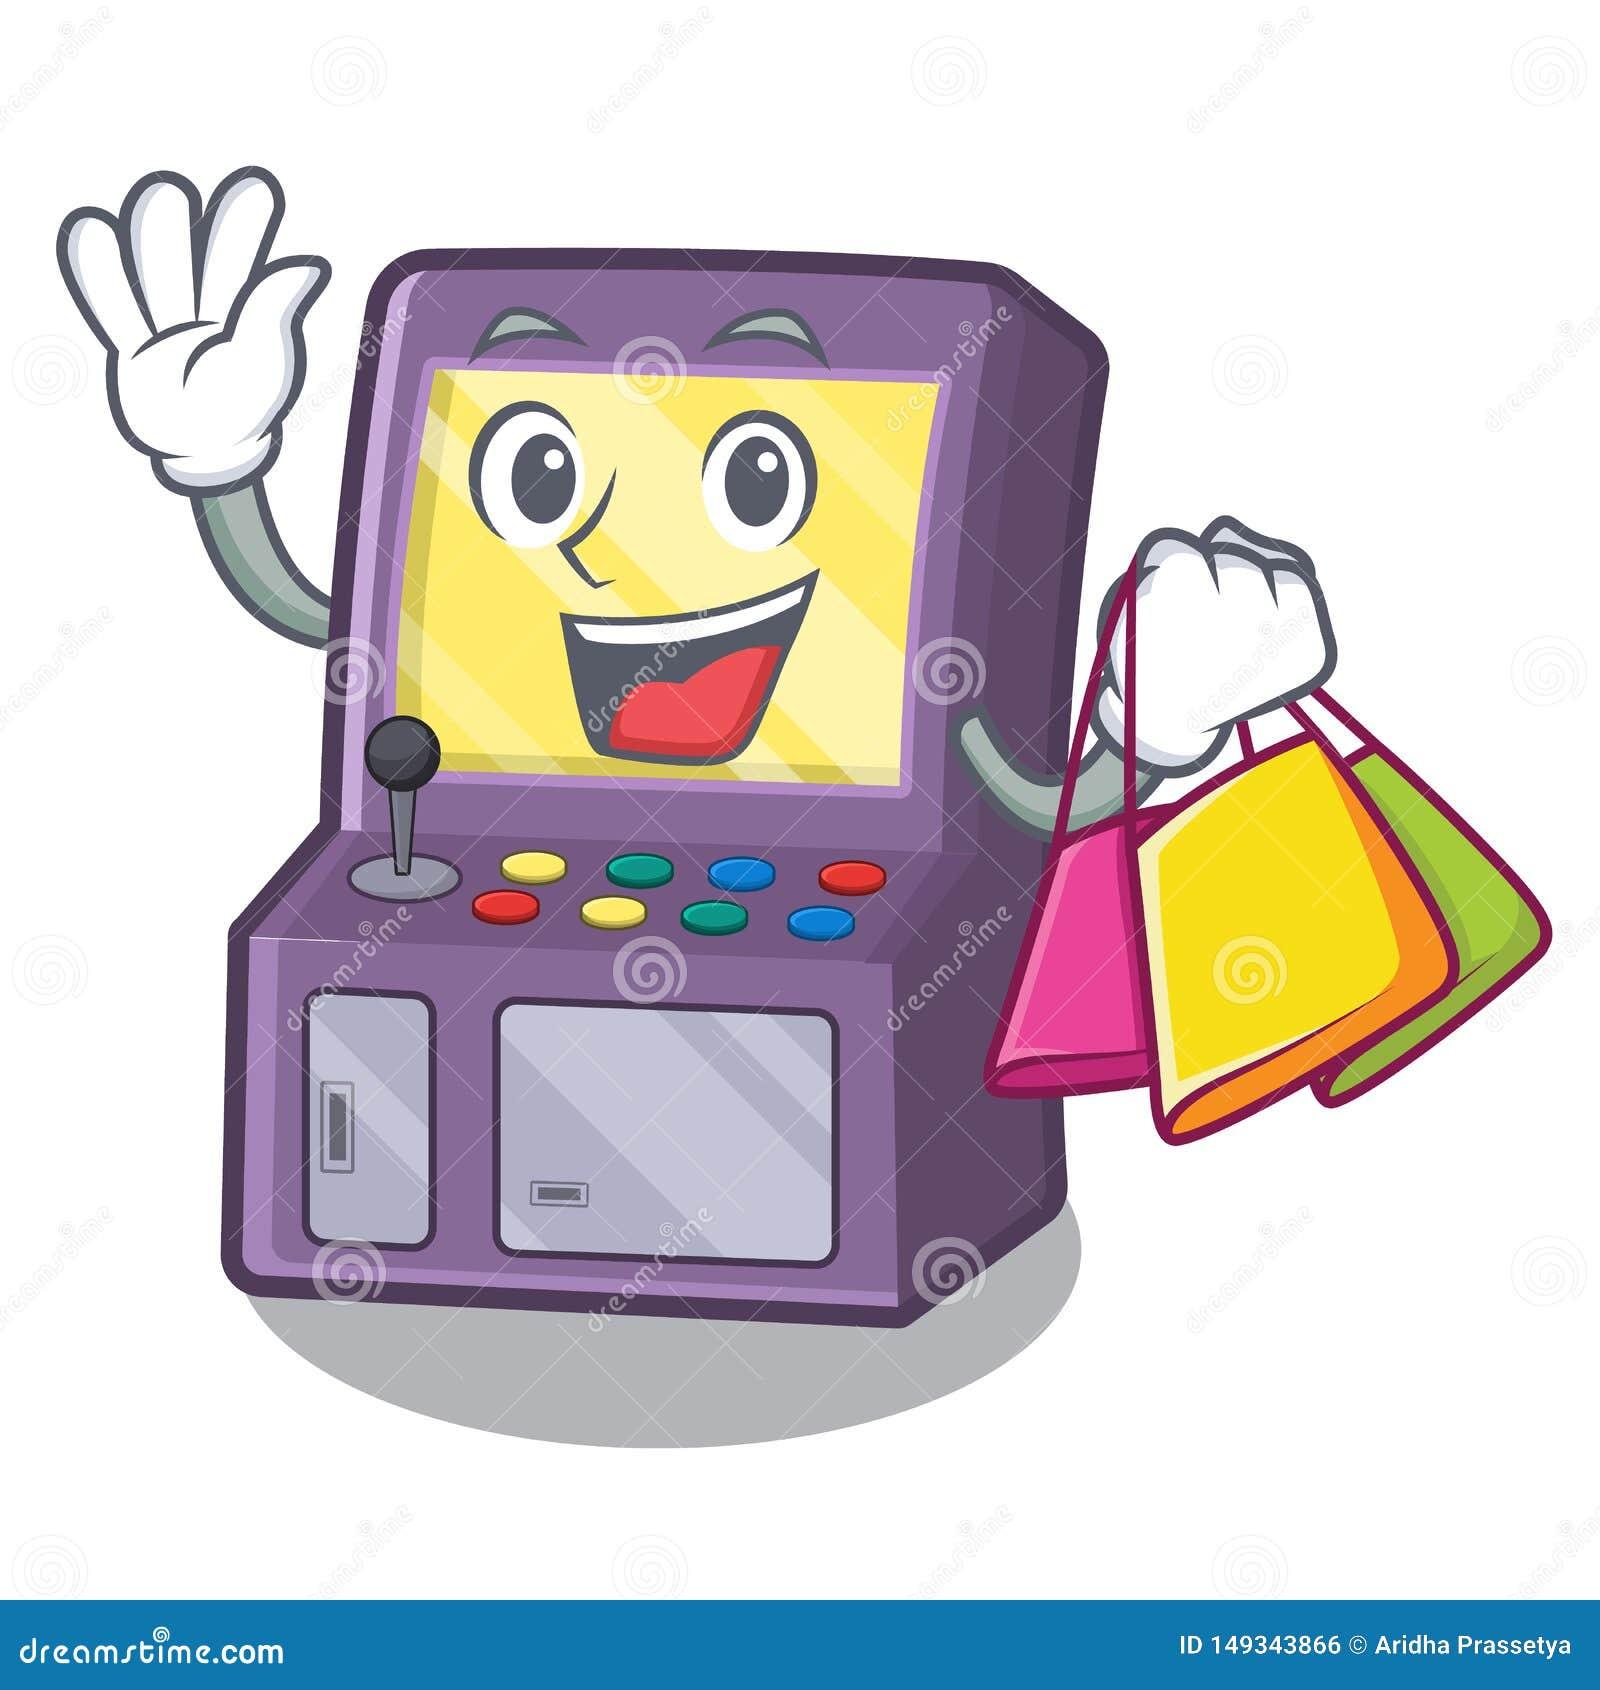 Shopping toy arcade machine in cartoon drawer